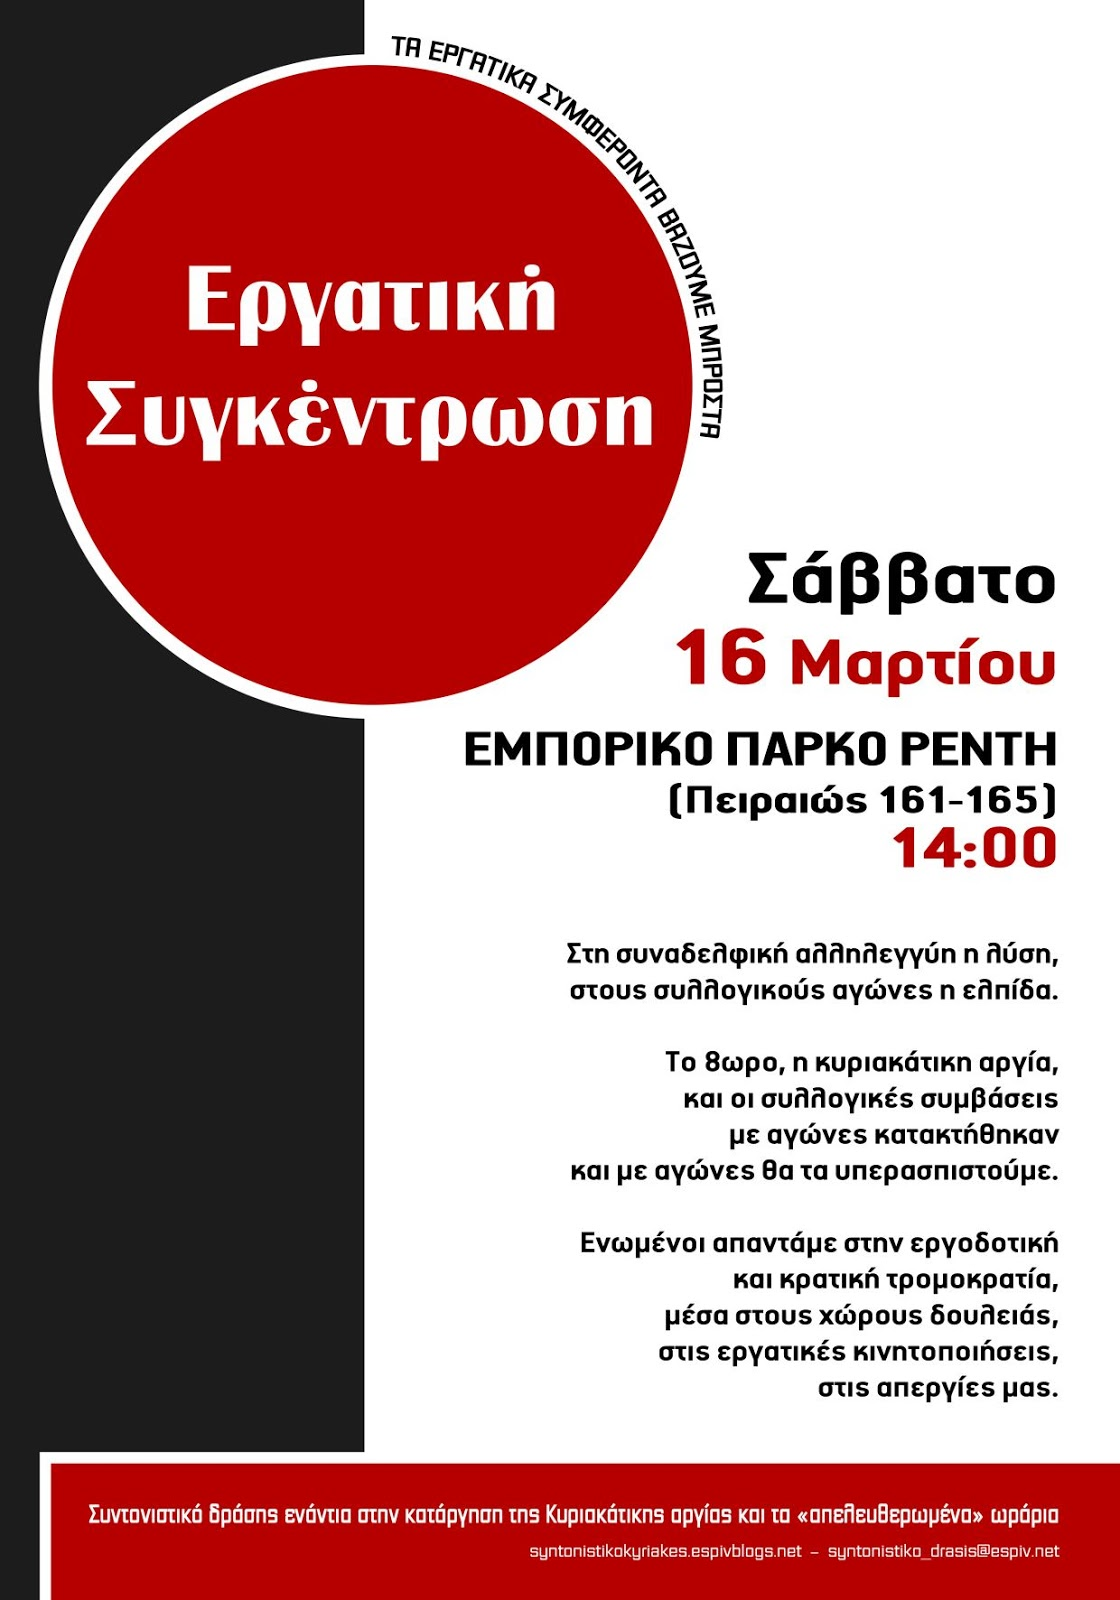 9f932d70a7 Συνέλευση Αντίστασης και Αλληλεγγύης Κυψέλης   Πατησίων  Εργατική ...